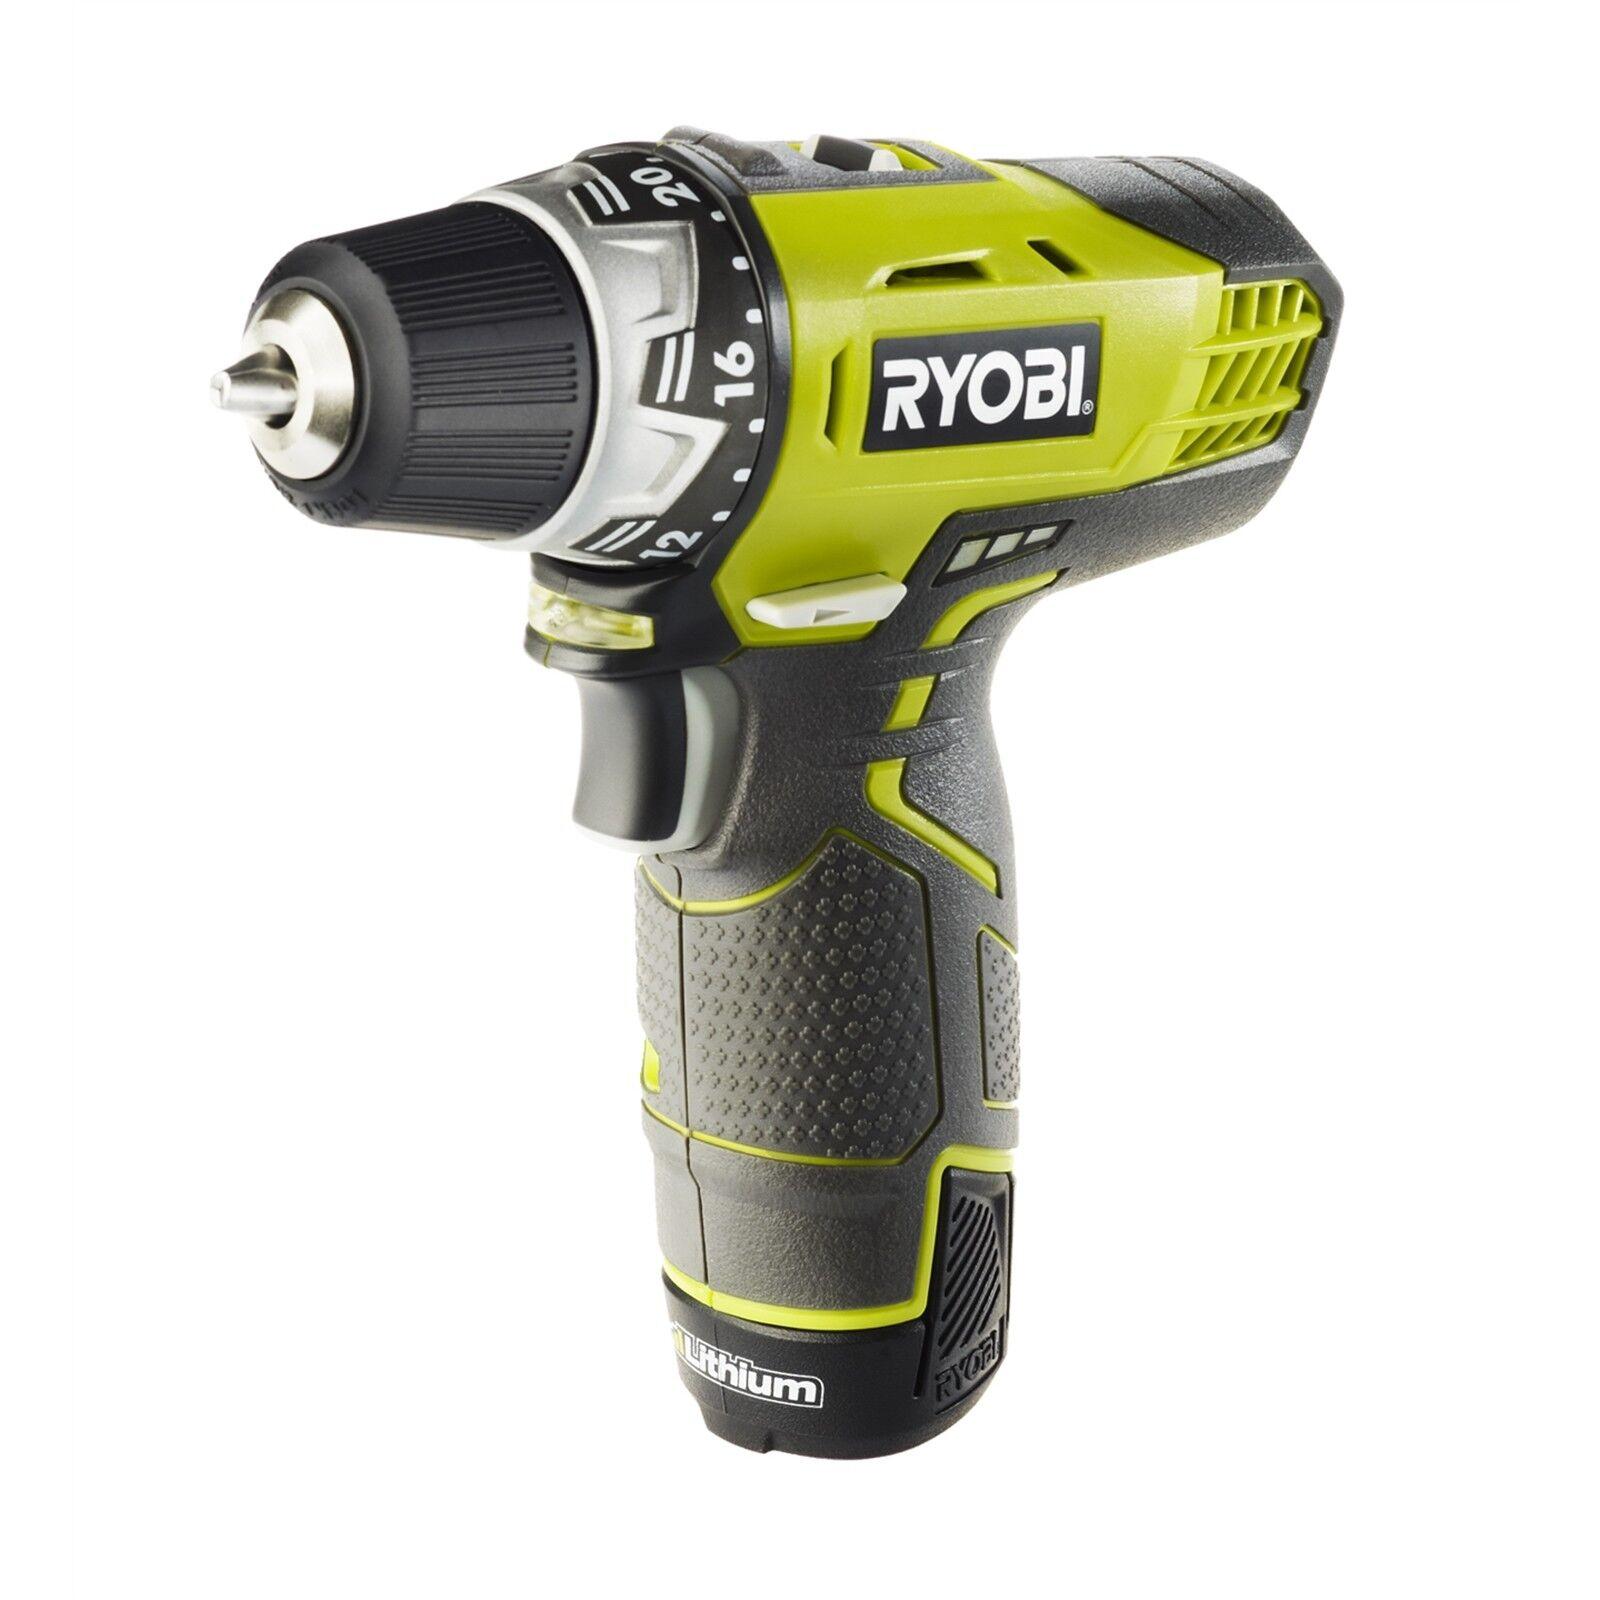 Ryobi 12V Cordless Drill Driver With 2 1.3Ah Batteries - Japan Brand